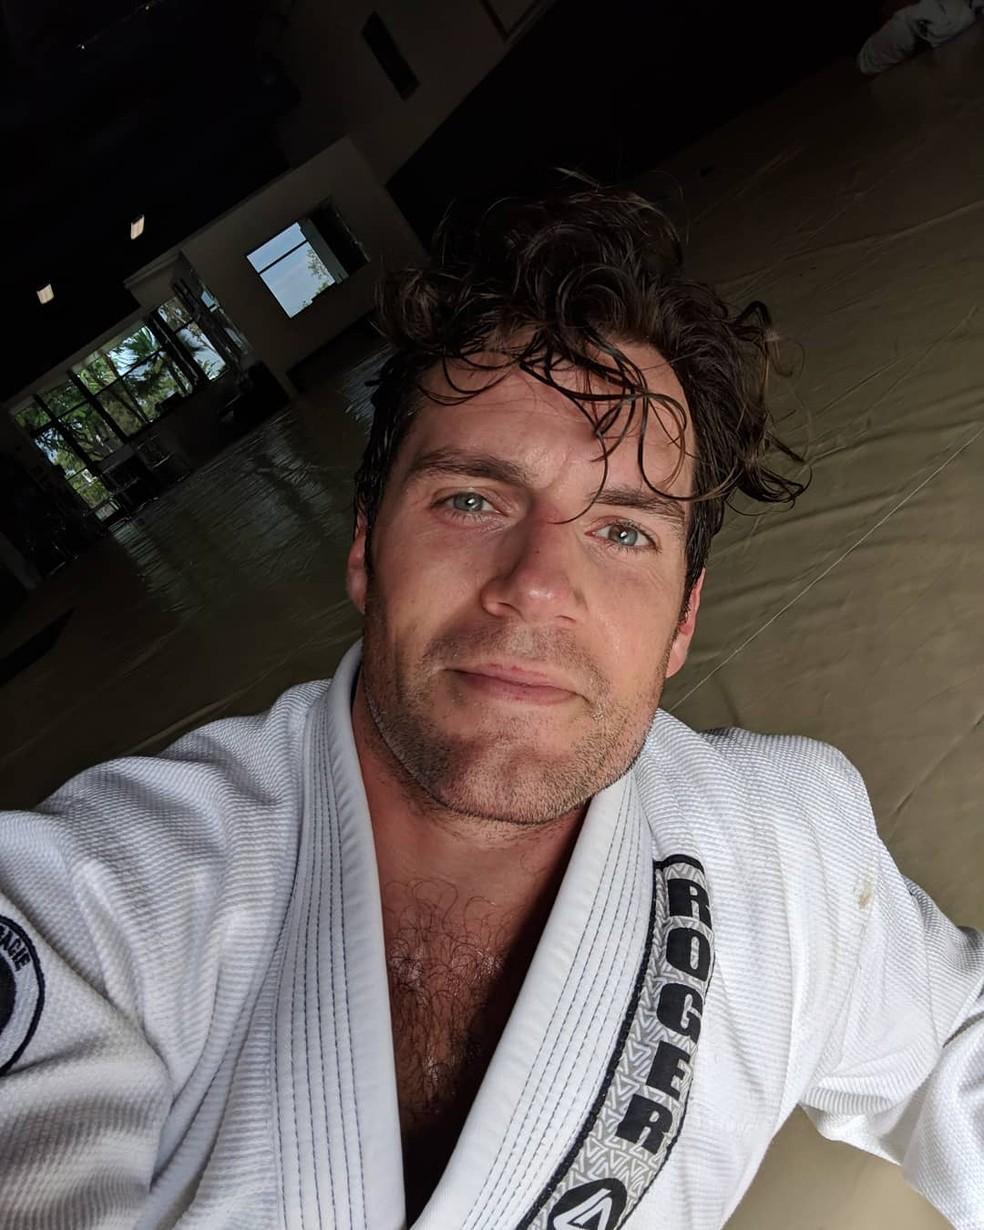 Henry Cavill é fã do jiu-jítsu brasileiro  — Foto: Reprodução